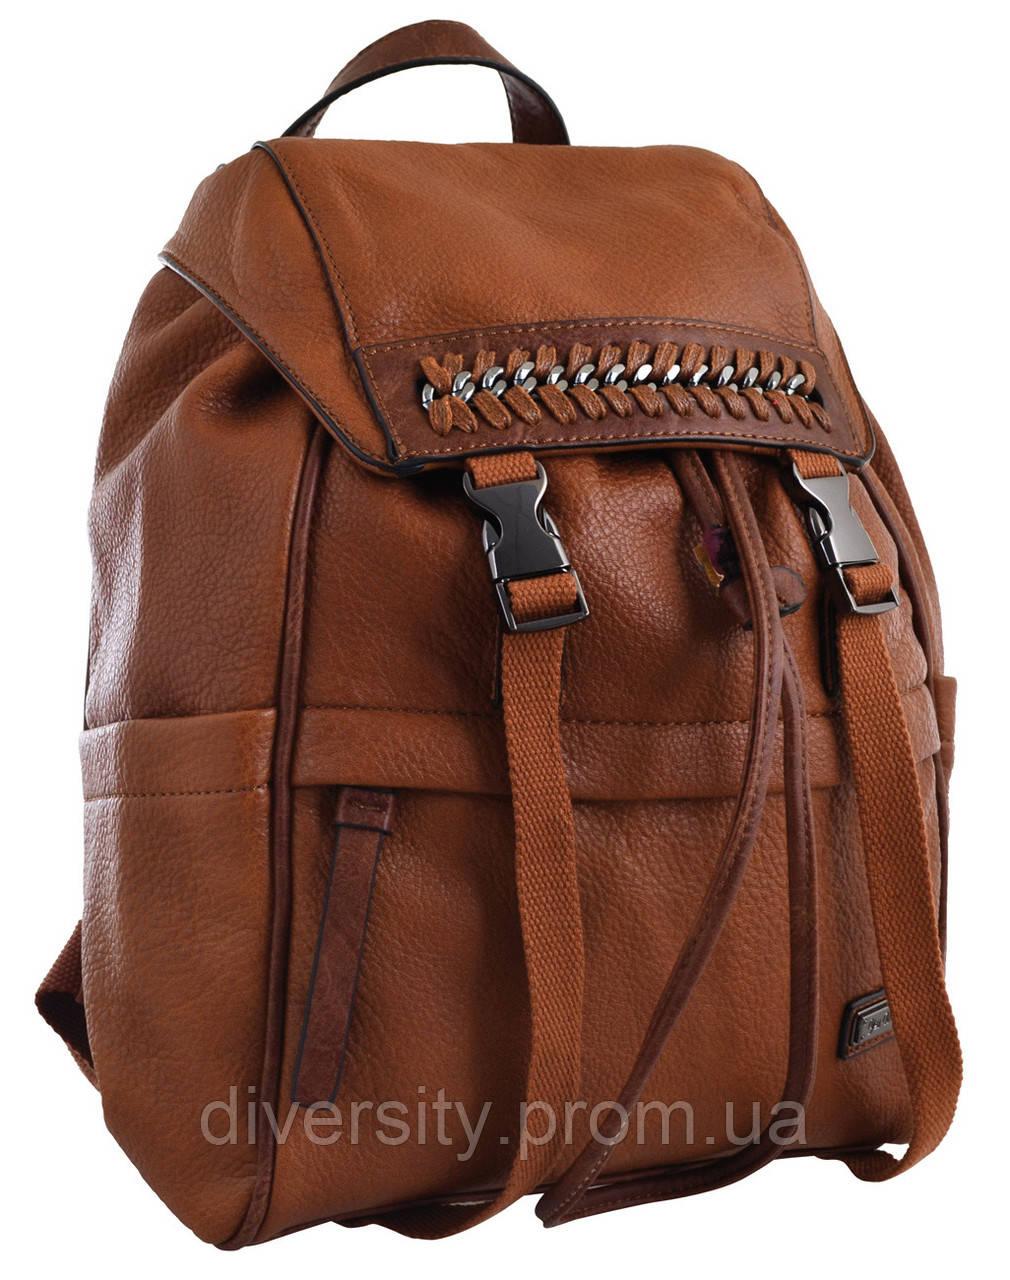 Женский рюкзак YES YW-12 коричневий                                                       ,